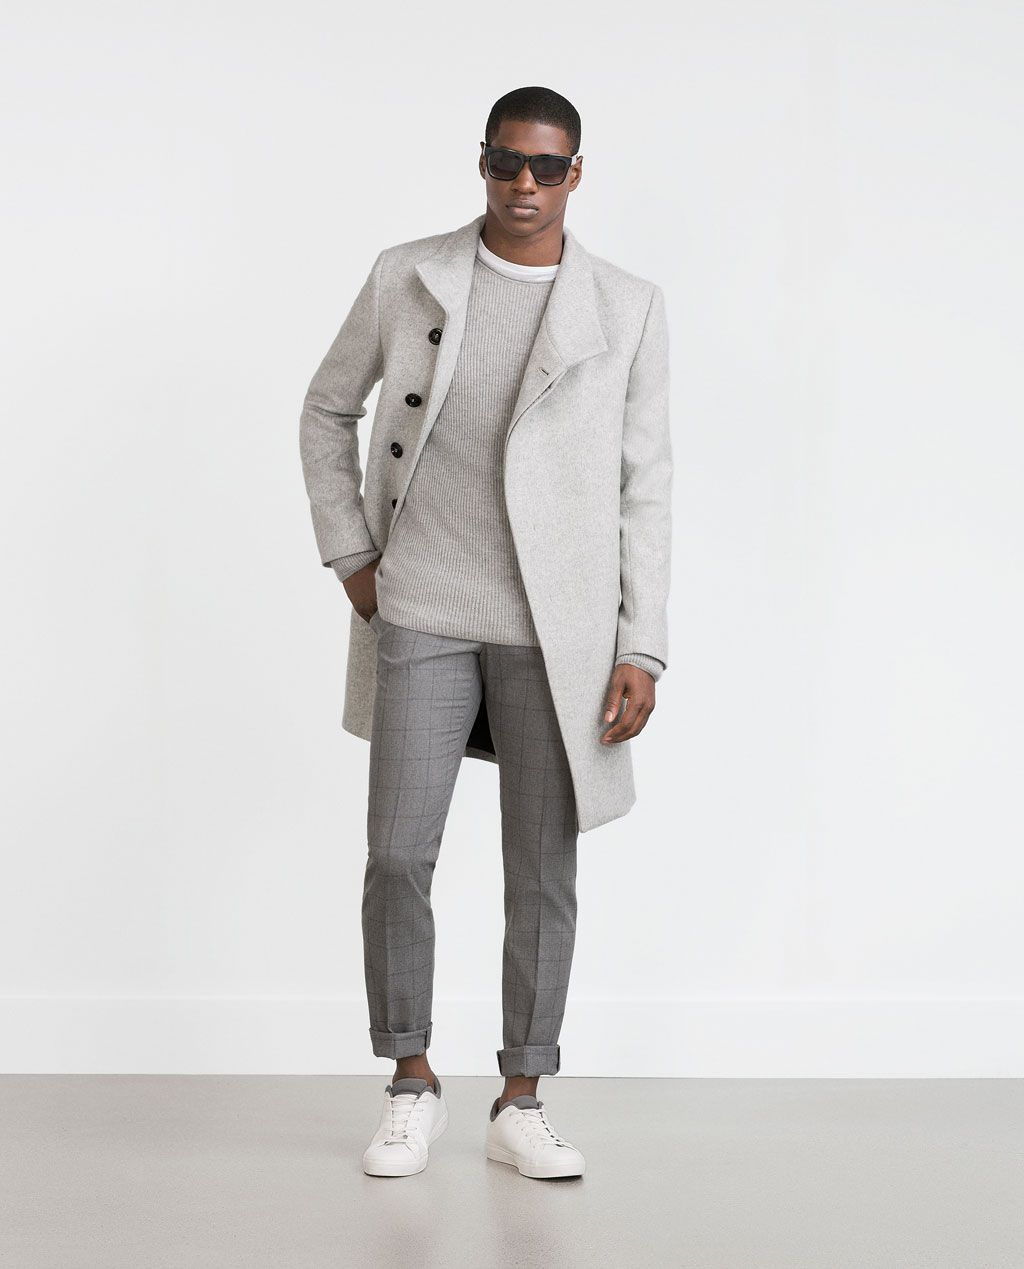 New Arrivals: Zara Fall 2015 Menswear | Coming soon, Zara ...